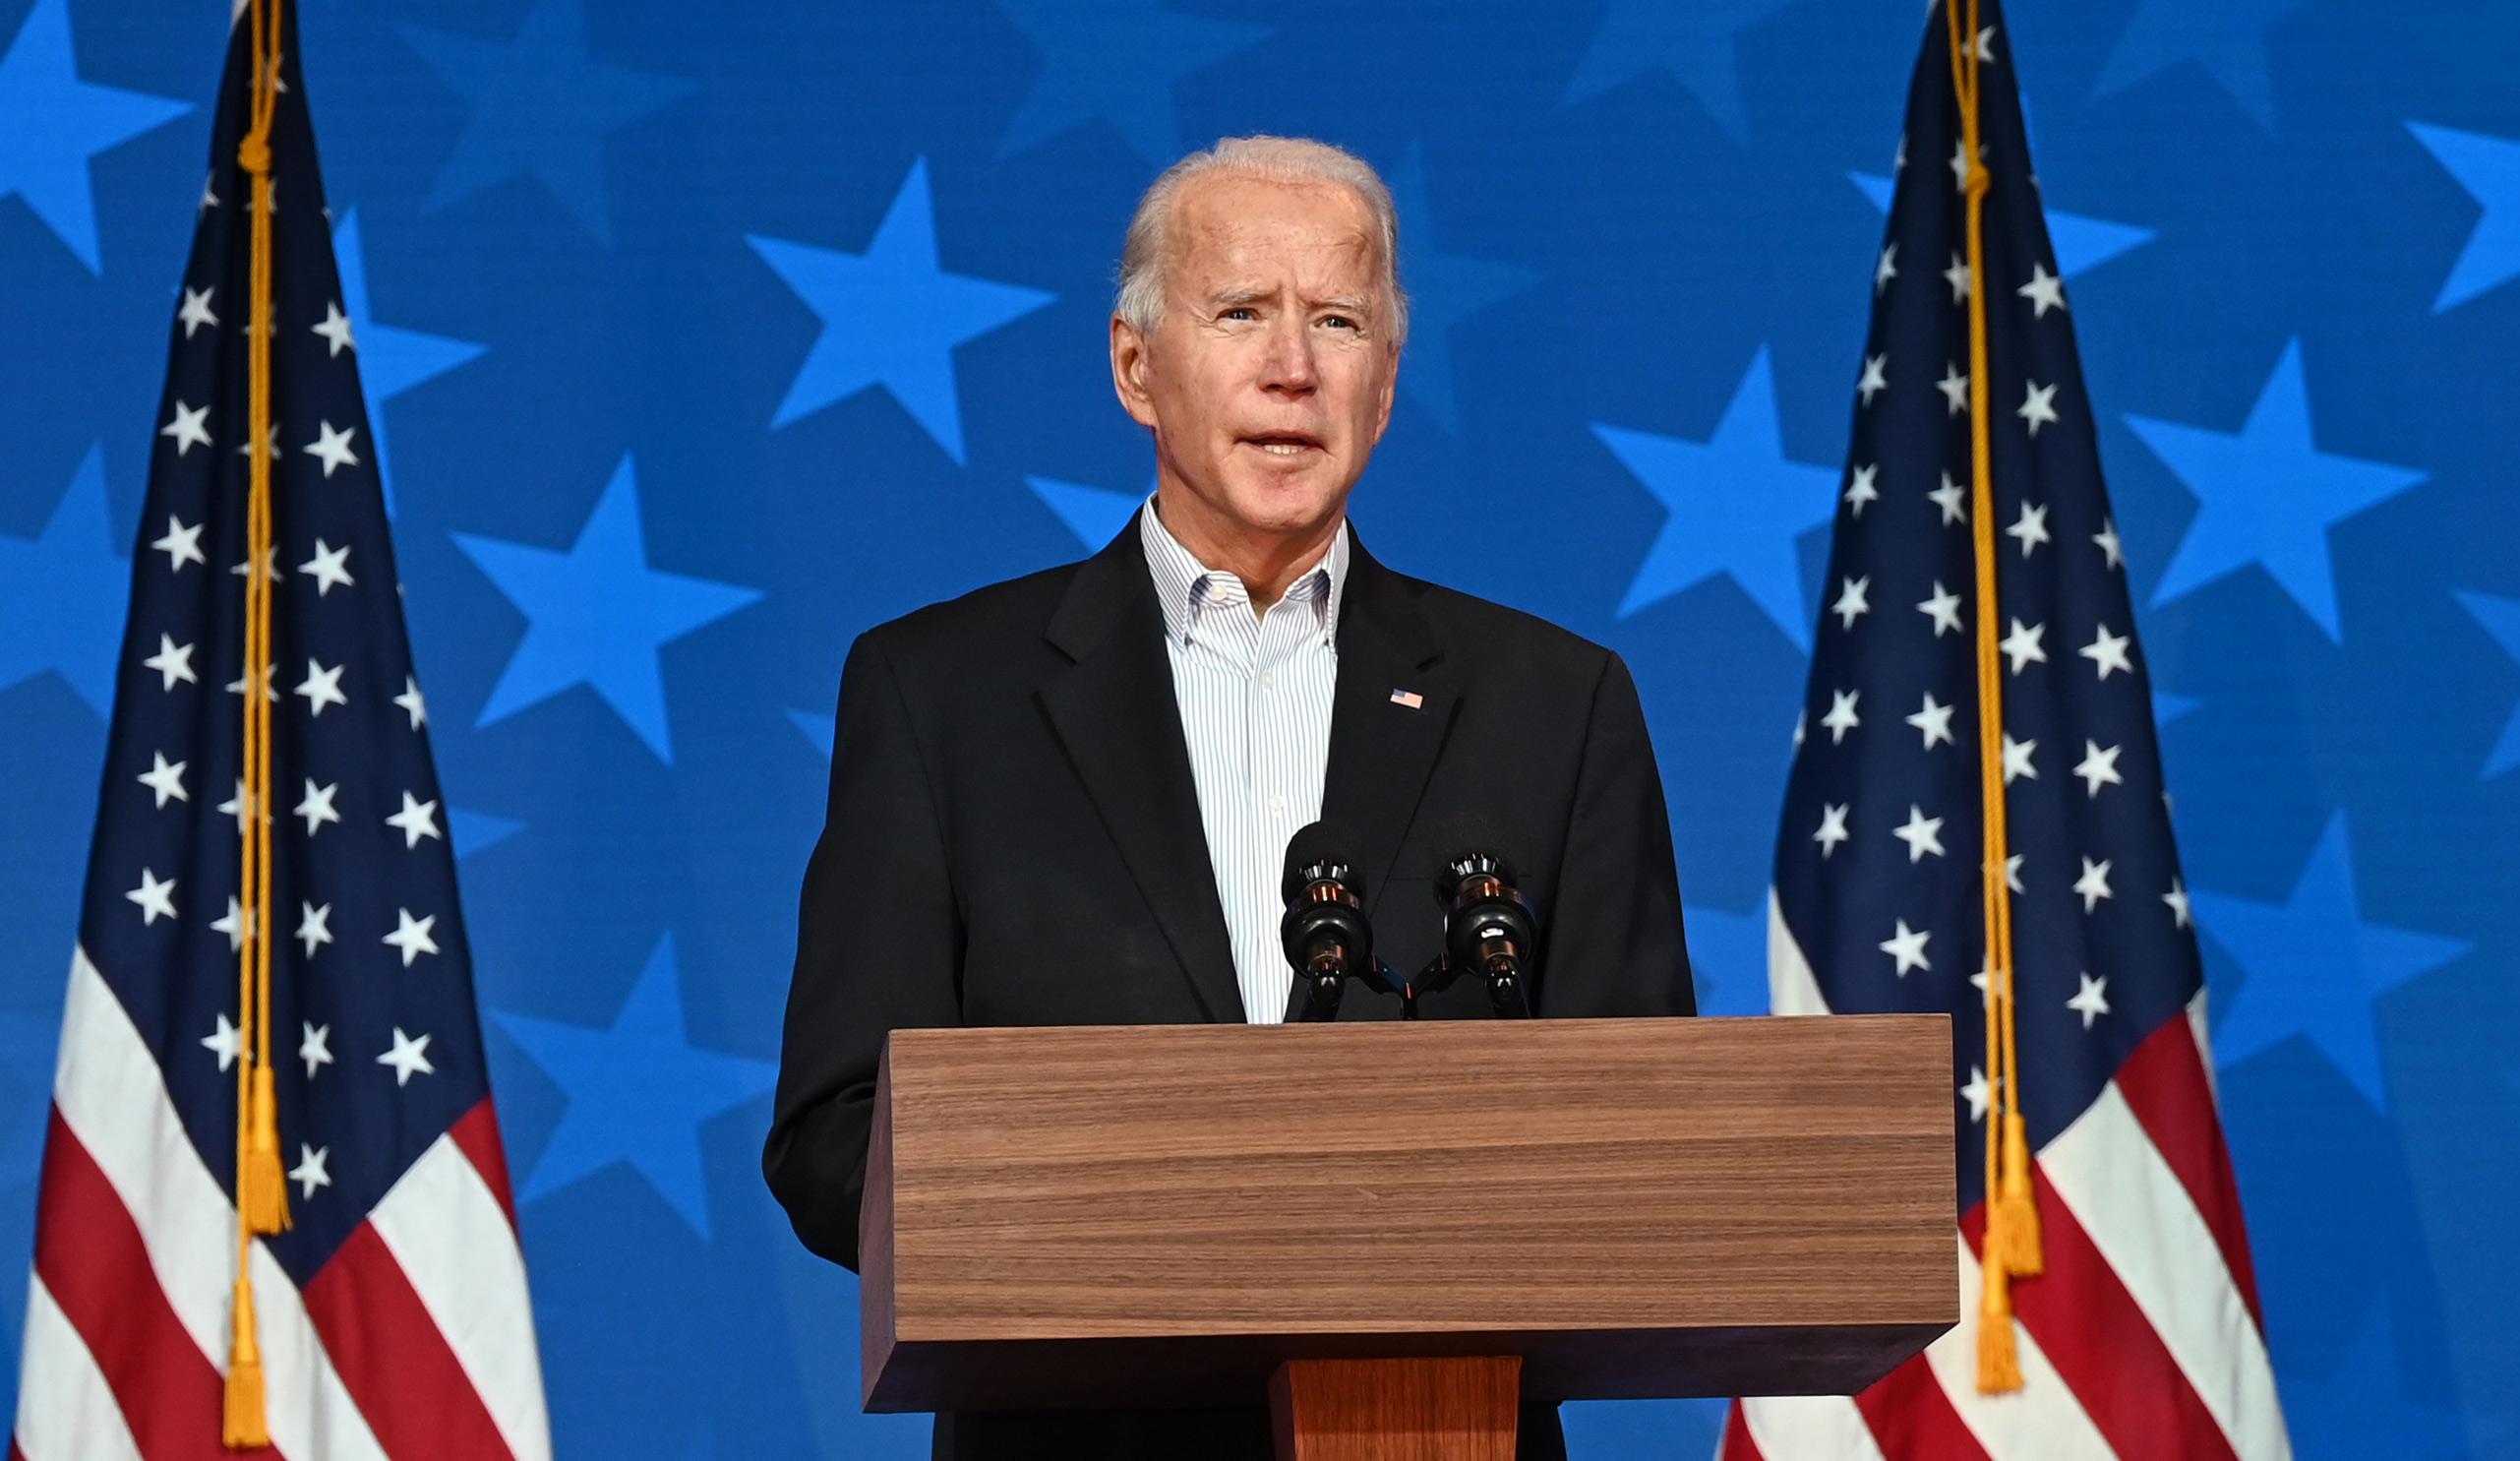 Democratic Presidential candidate Joe Biden speaks at the Queen venue in Wilmington, Delaware, on November 5.